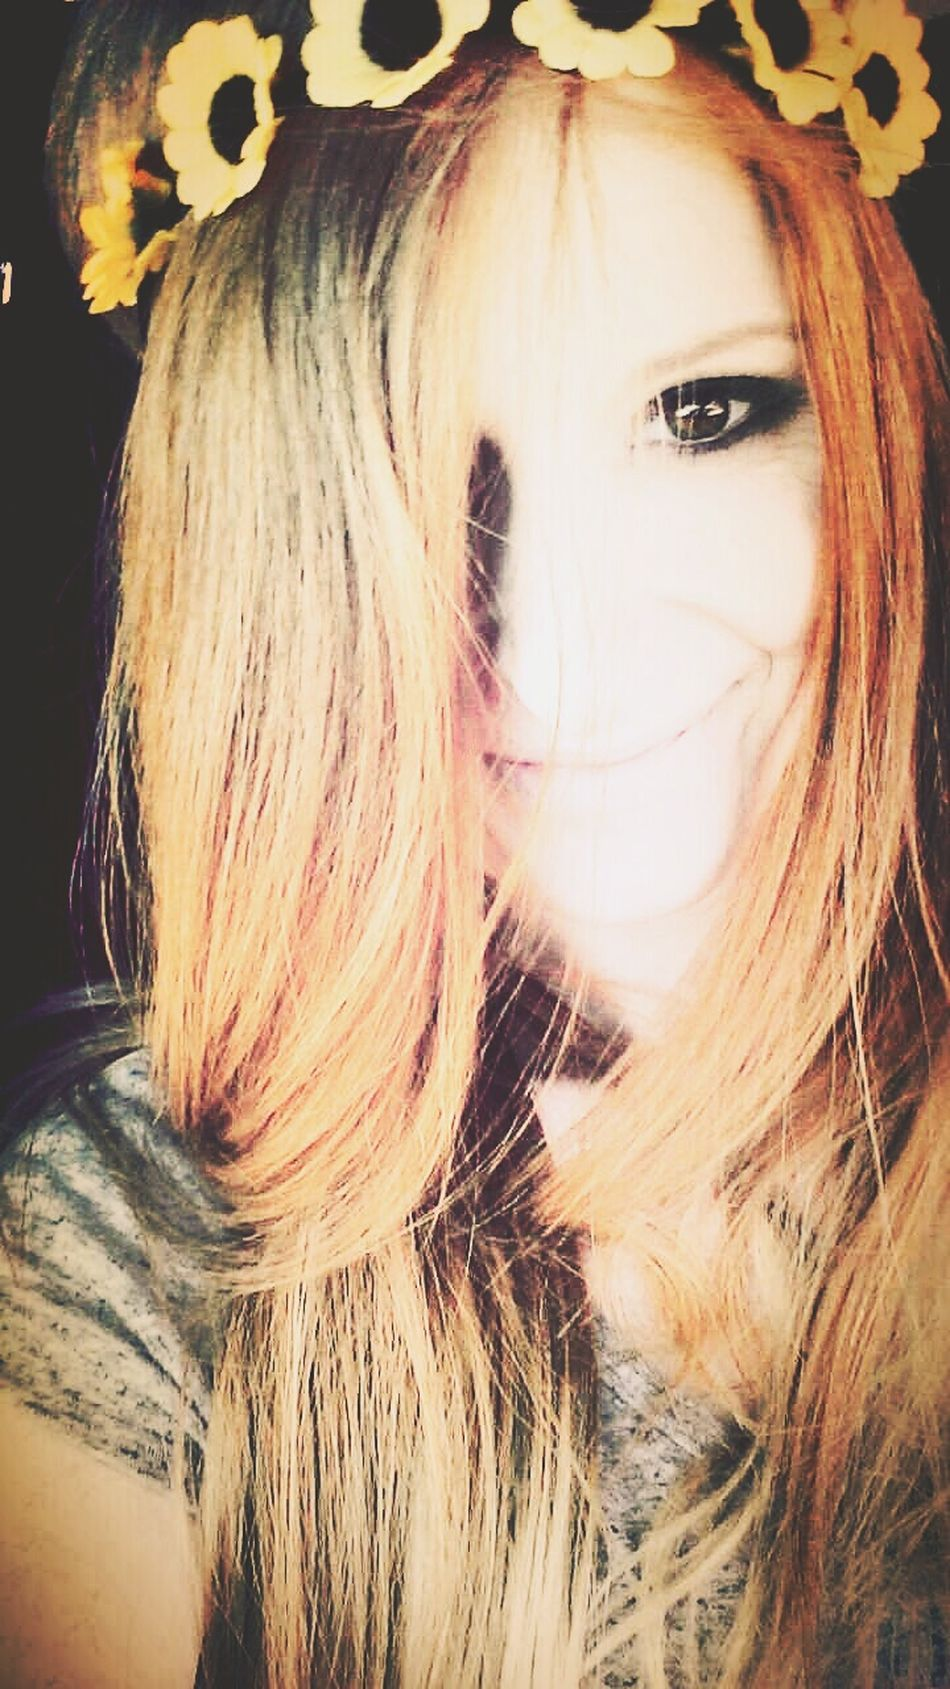 Bestdaysss HappinessIsTheKey Beauty Selfie ✌ Hippie ✌ Ginger